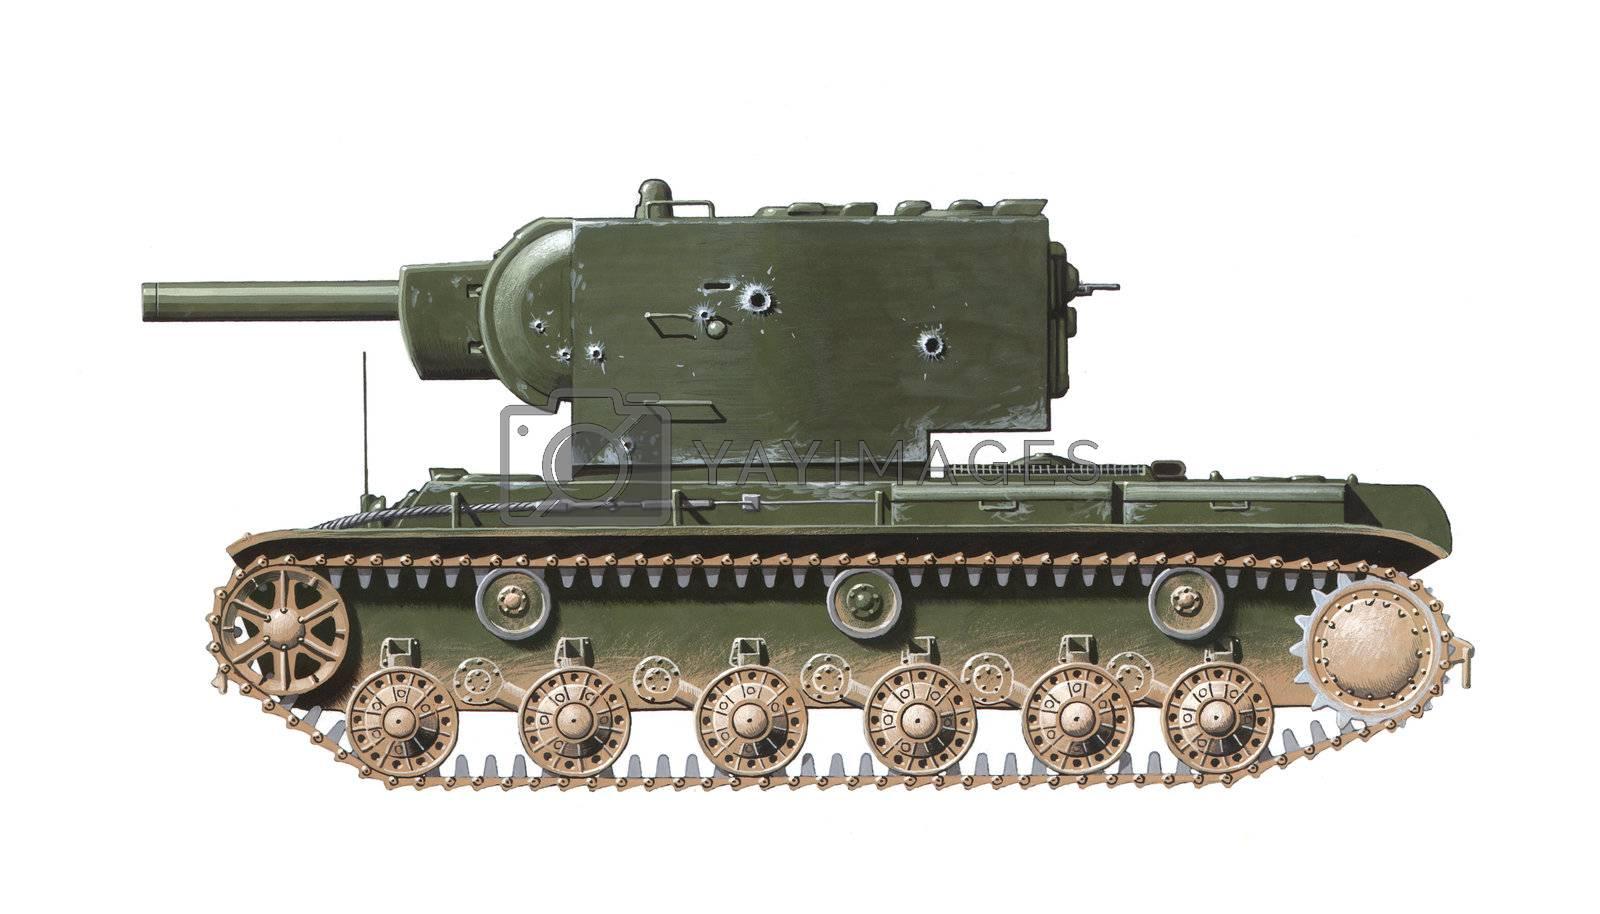 KV-2 heavy tank by martinspurny